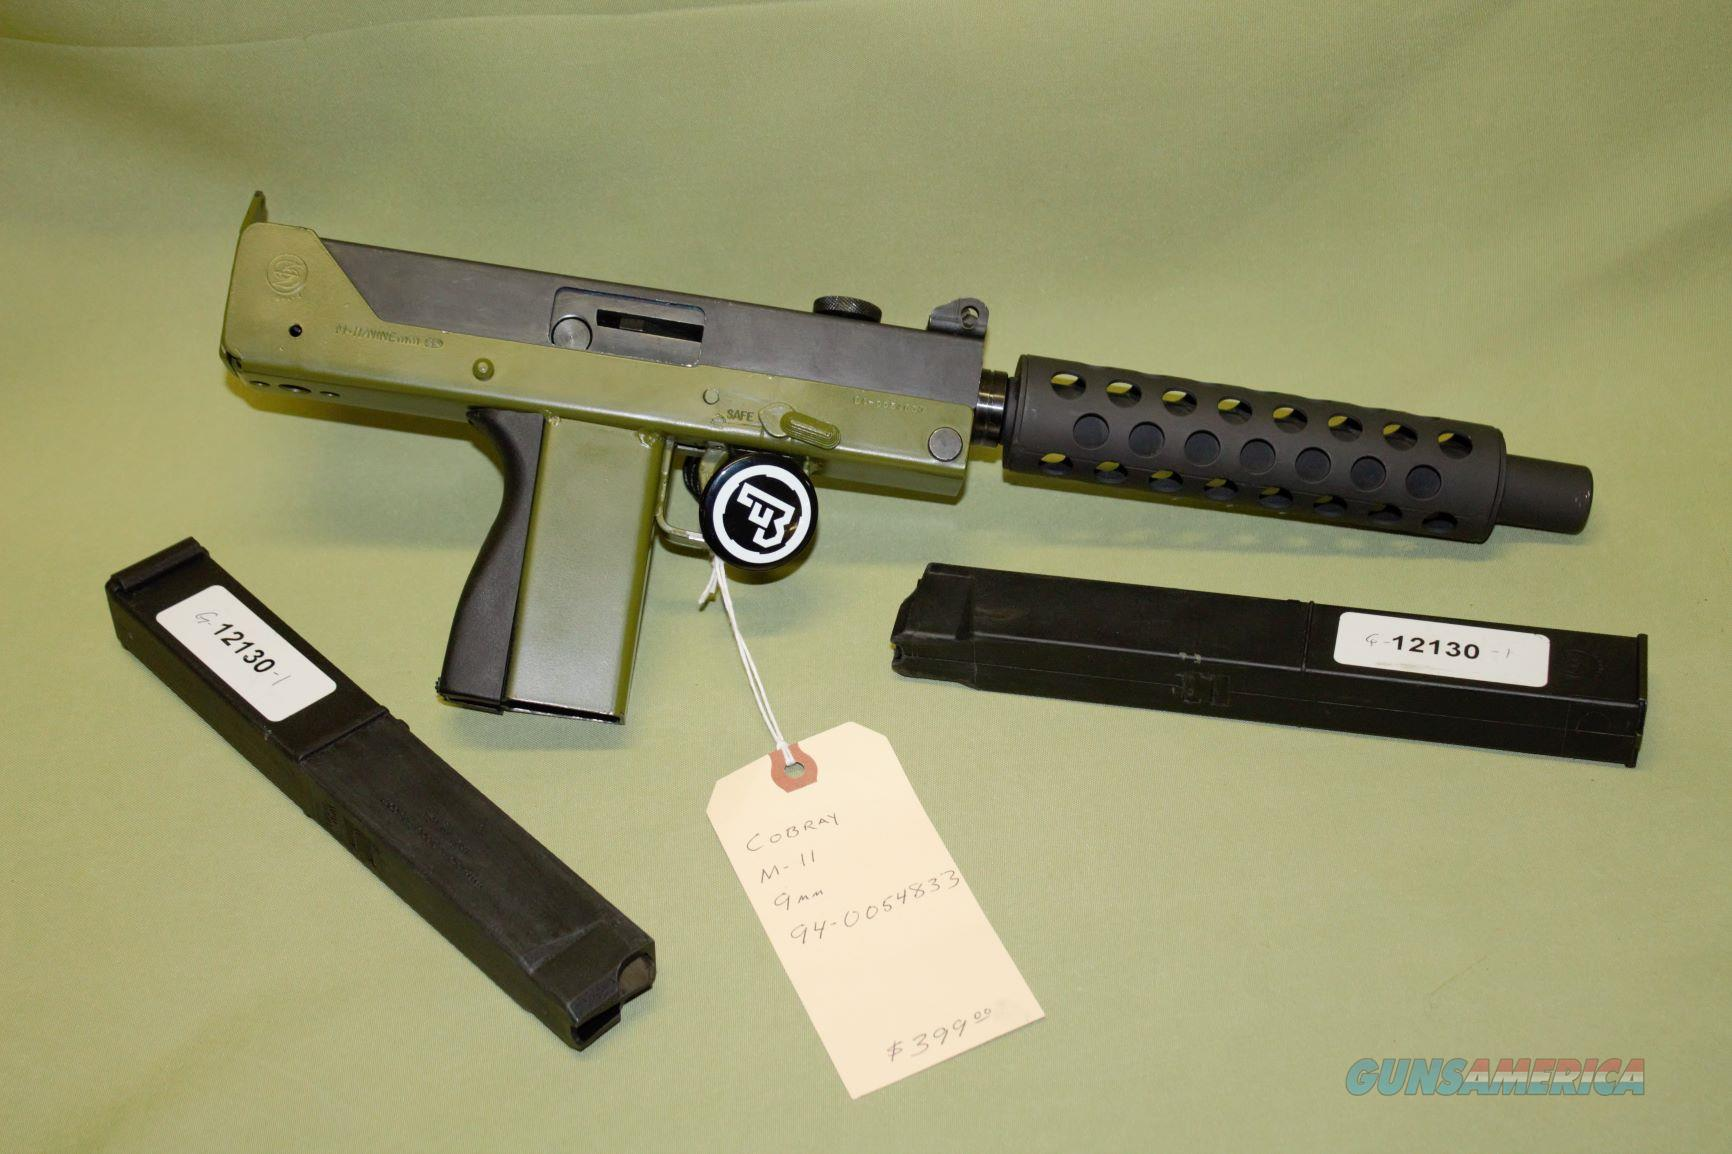 Cobray M-11 9mm  Guns > Pistols > Cobray Pistols